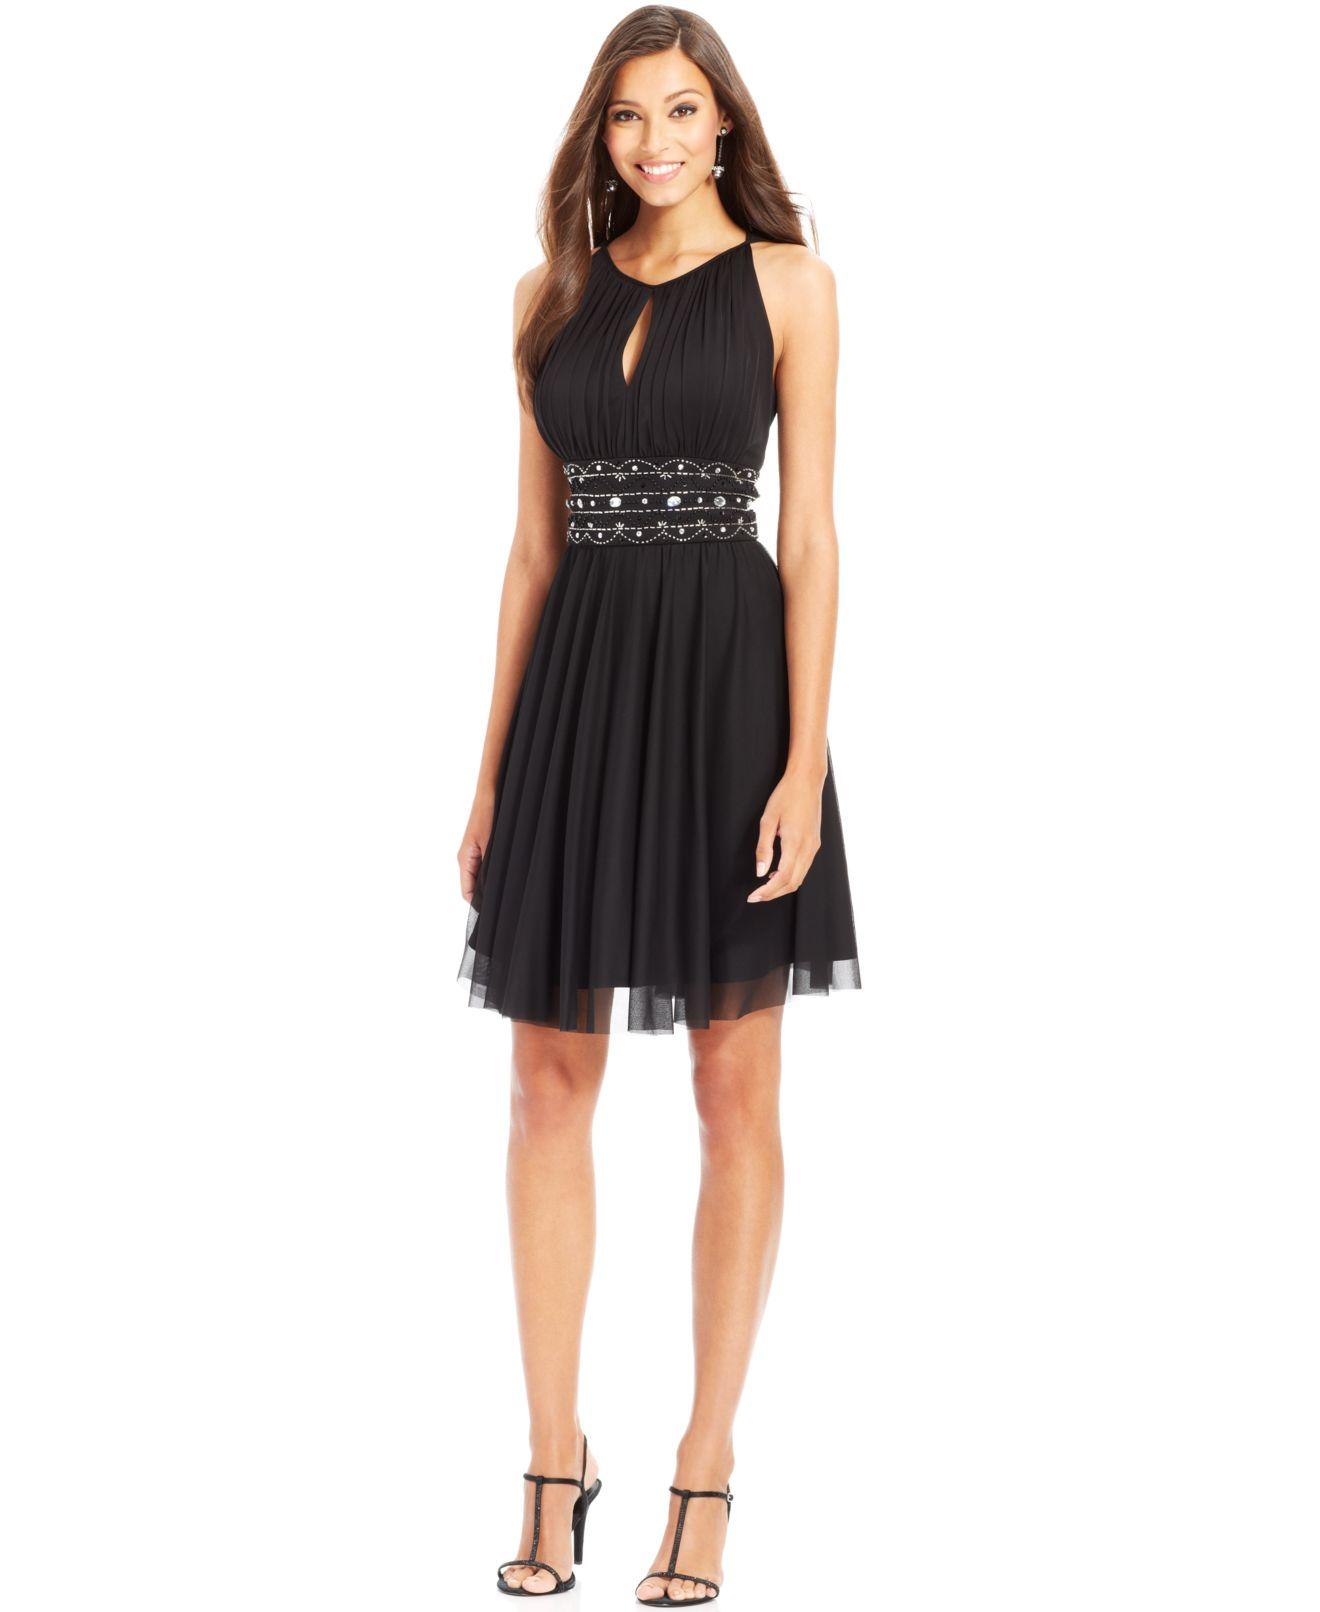 macys evening dresses sale photo - 1